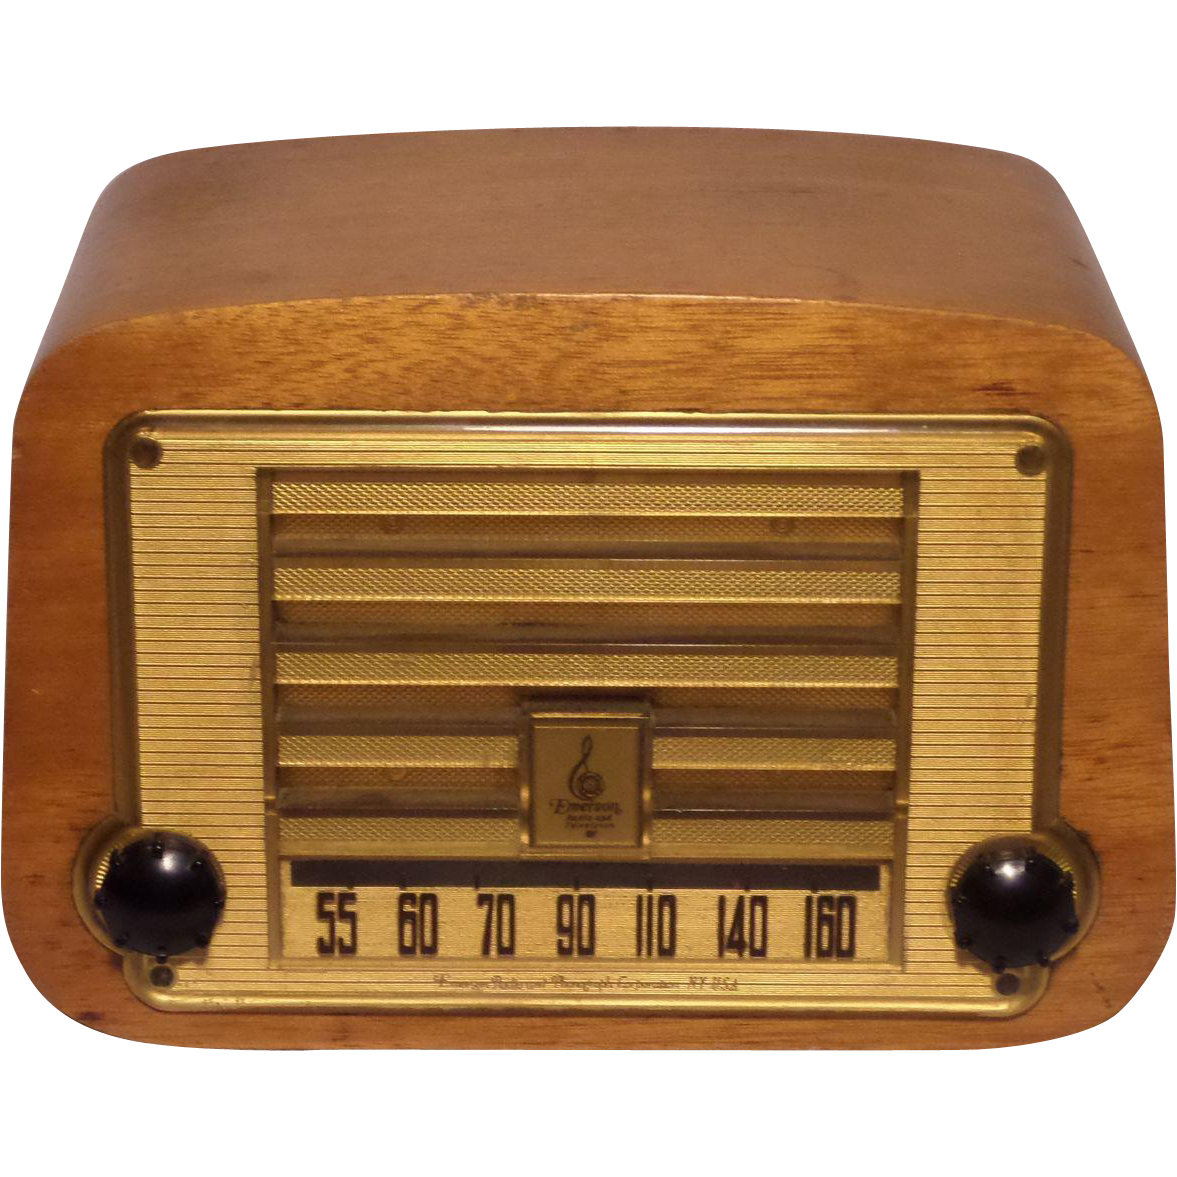 Repaired Refurbished 1946 Emerson Tube Radio Model 578 Vintage Radio Antique Radio Old Radios